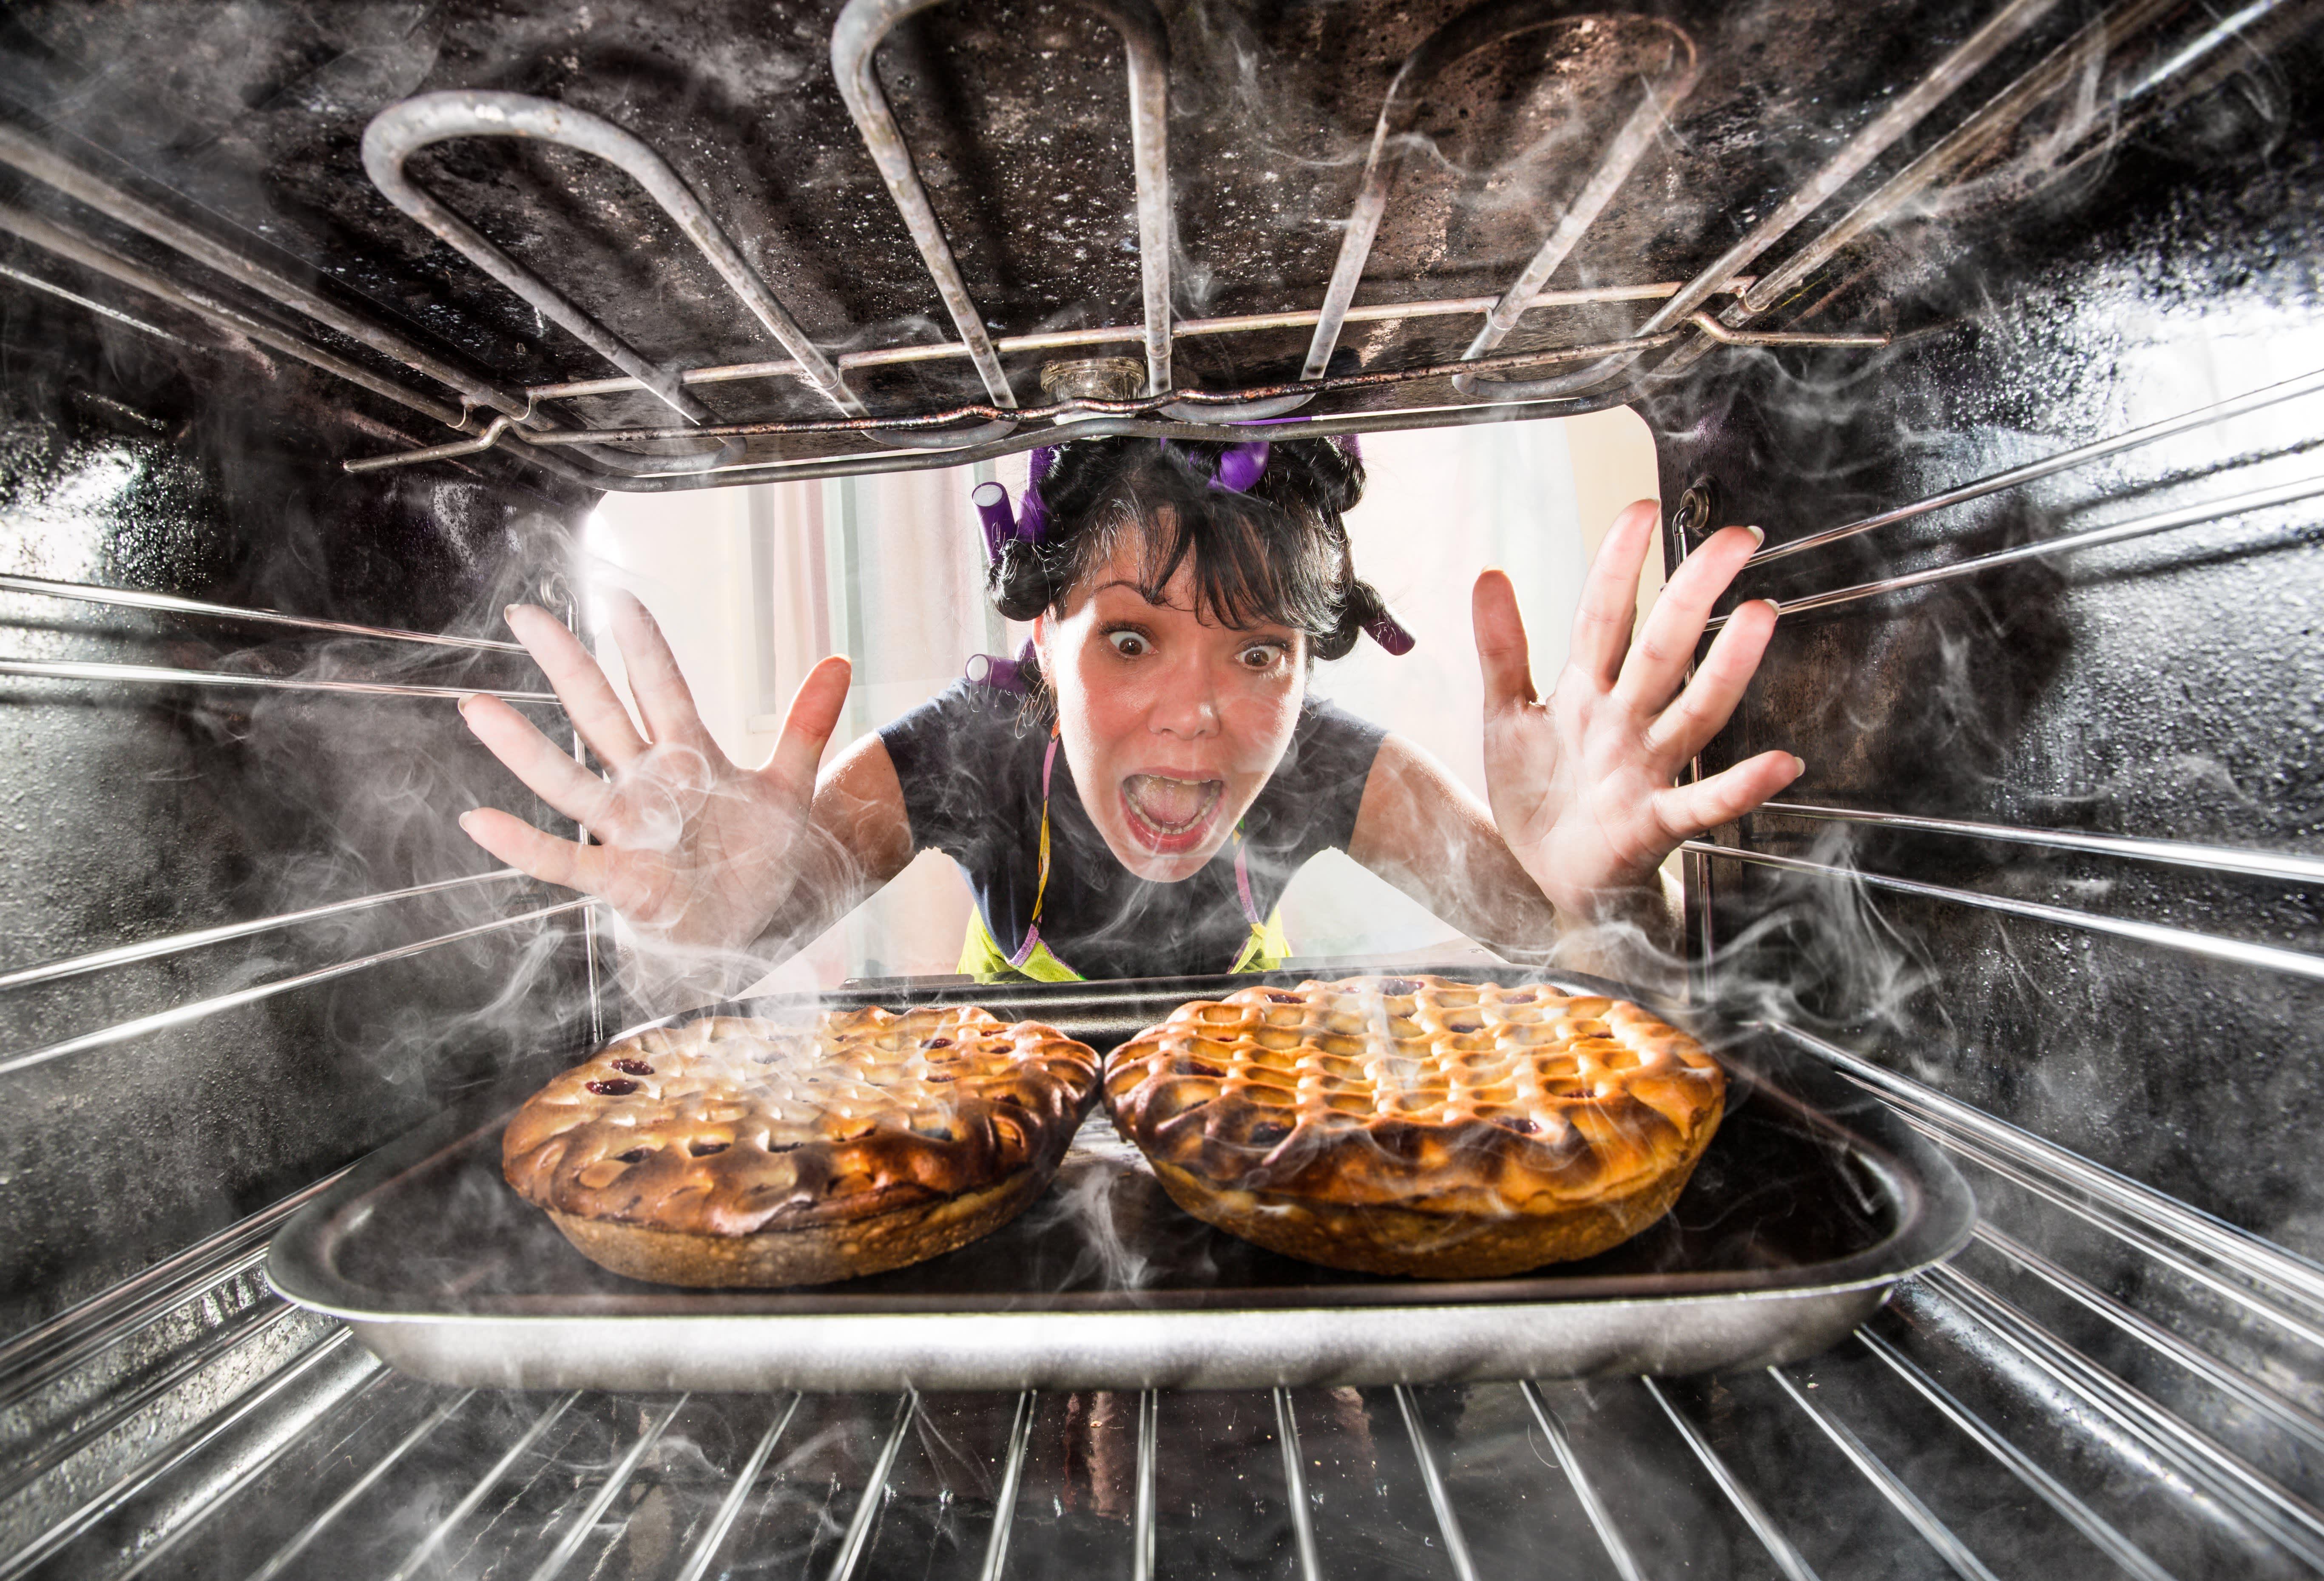 Pie burned in oven